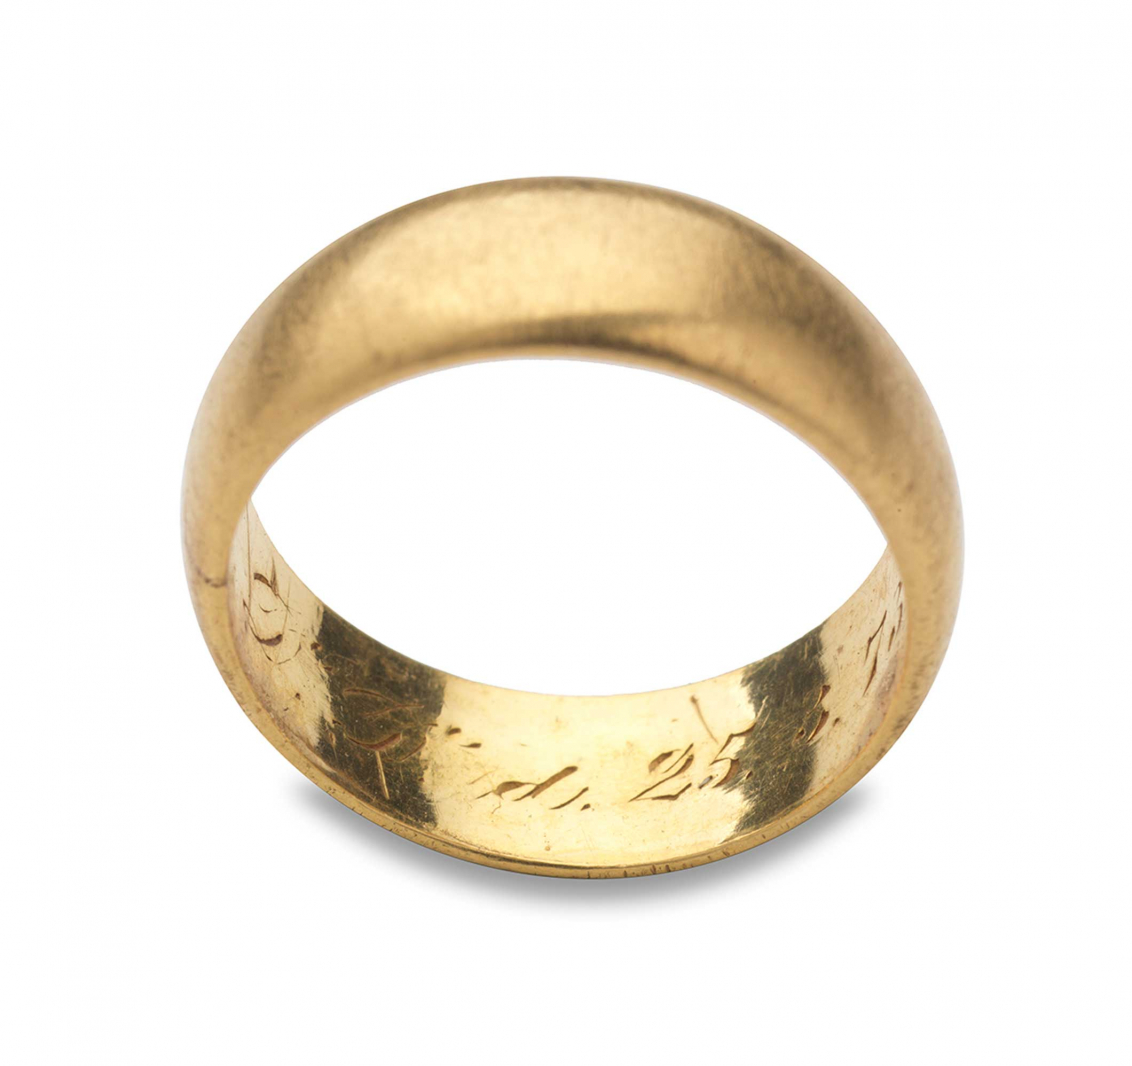 Goldener Ring mit Inschrift